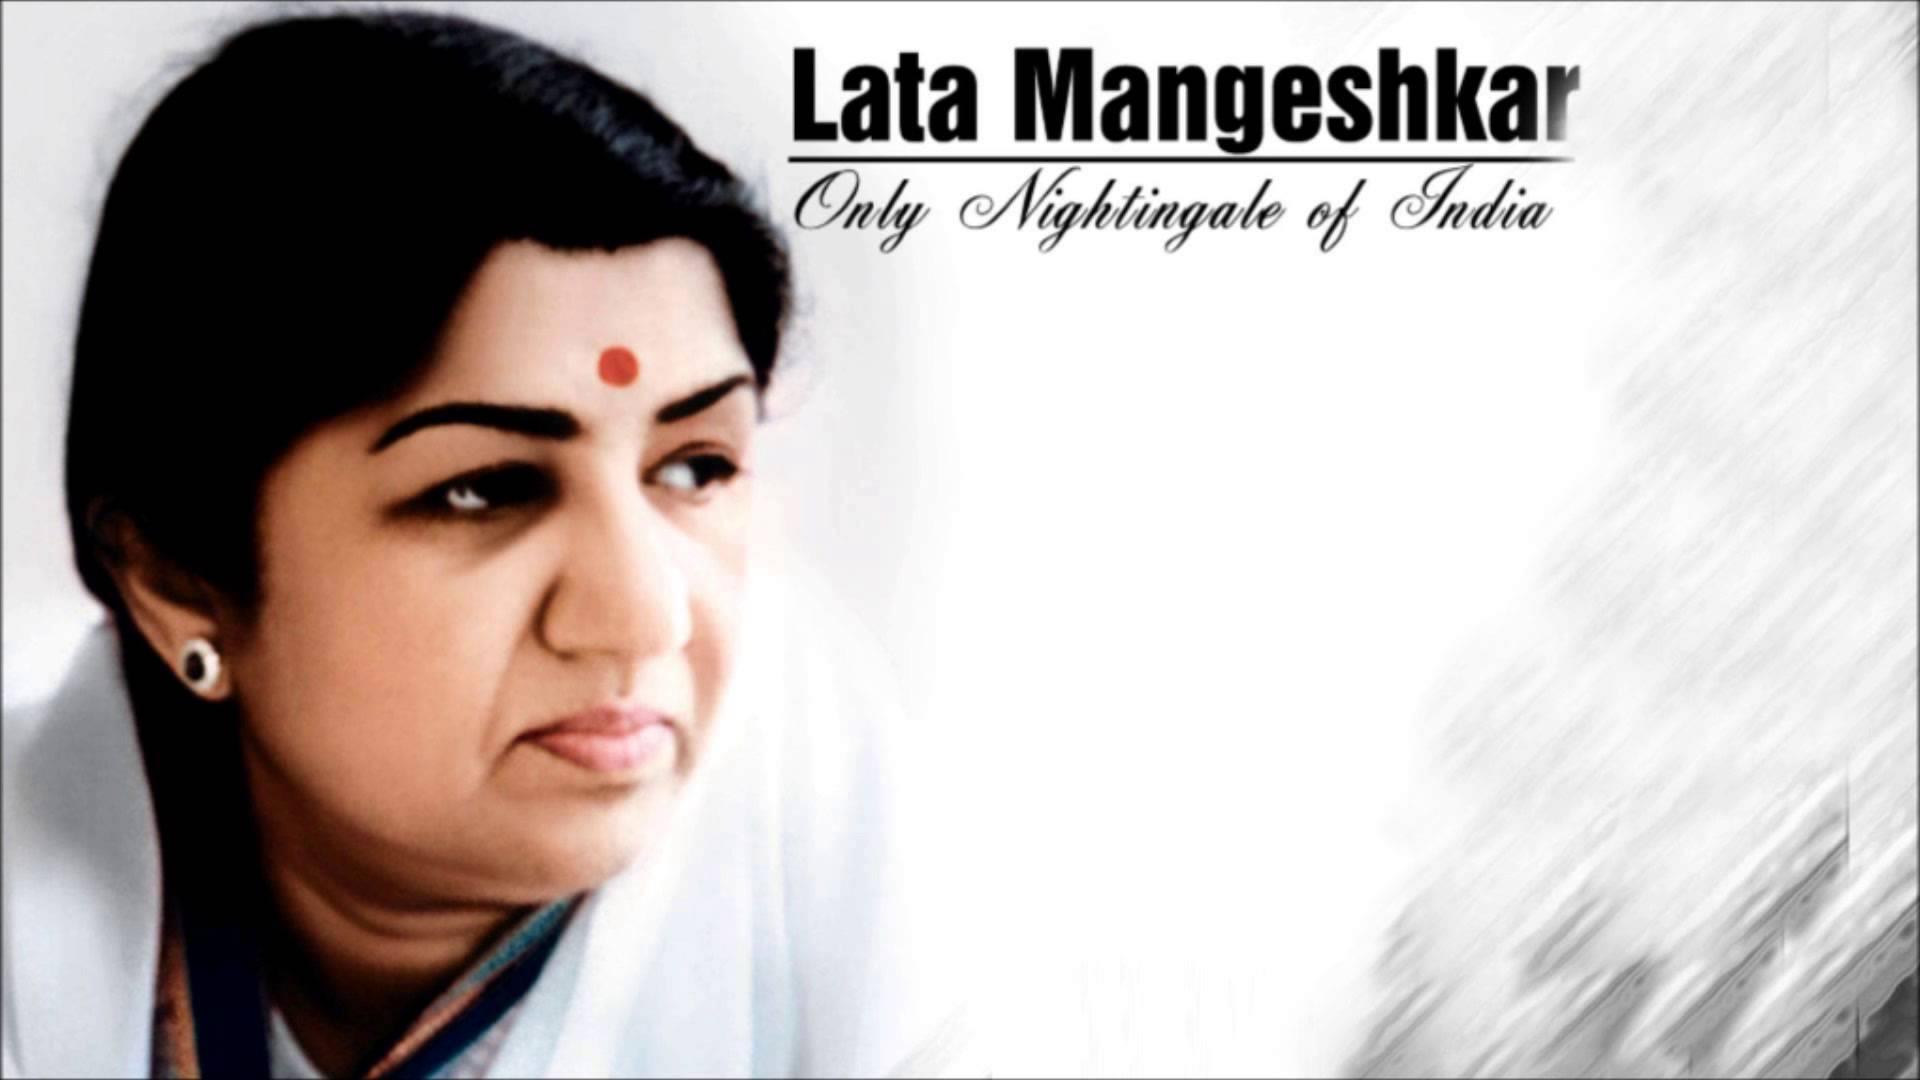 Lata mangeshkar top best songs download